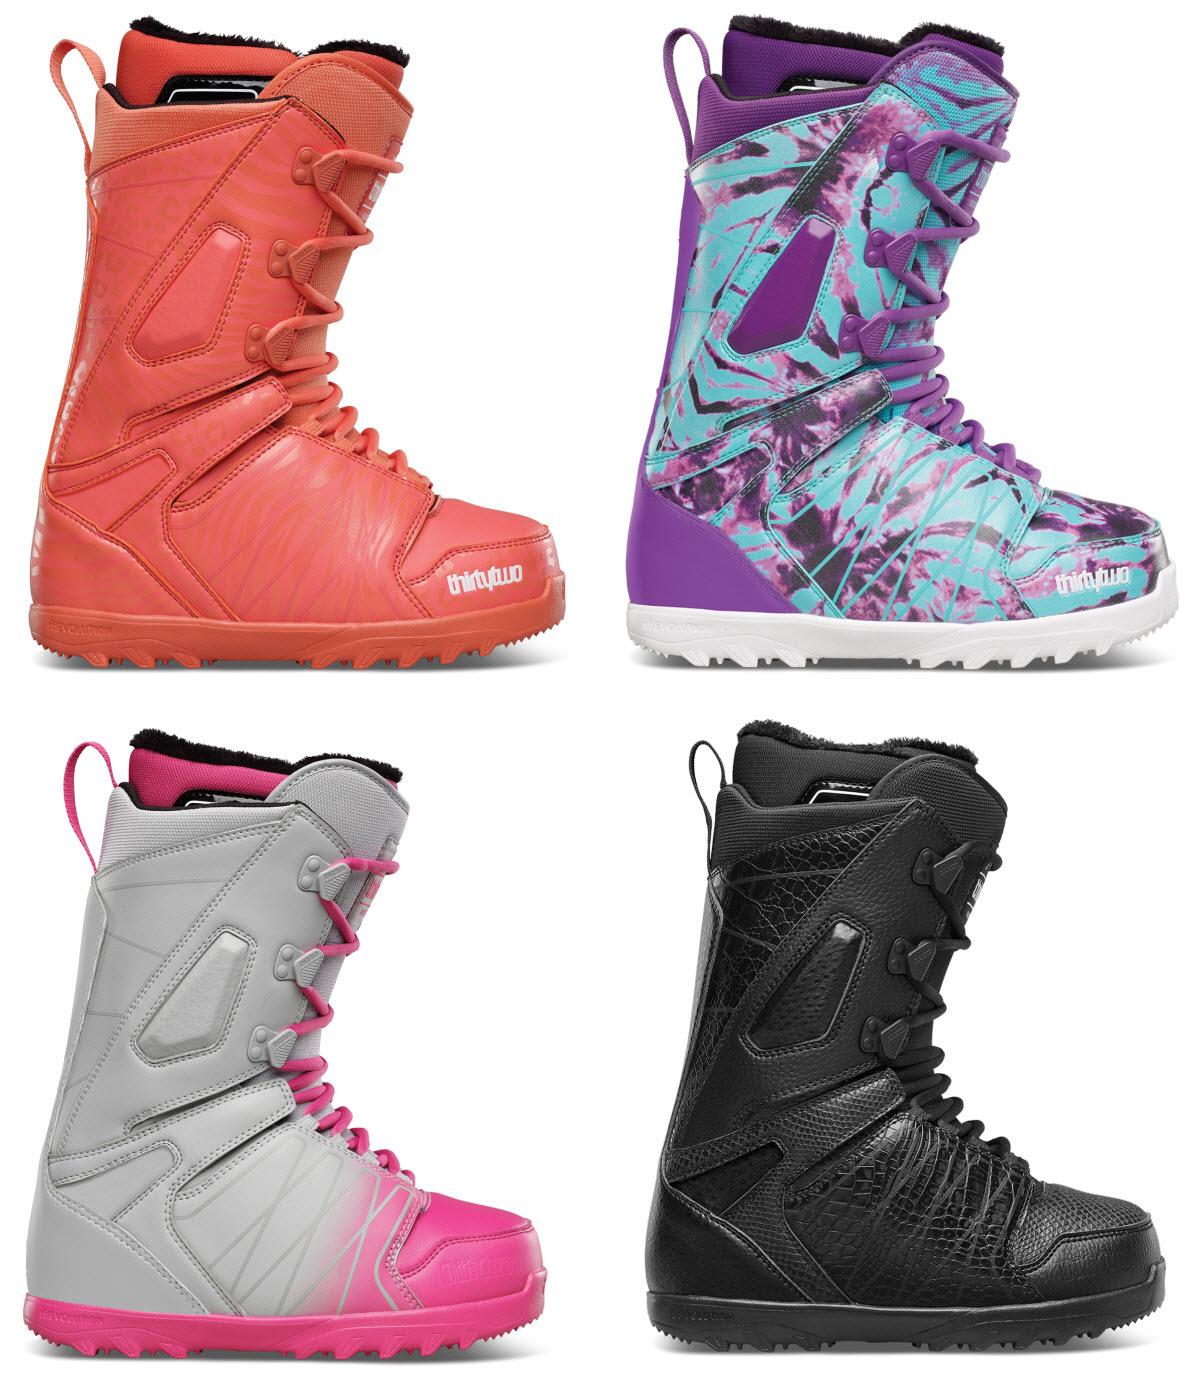 thirtytwo snowboard boots sle womens lashed no box uk 4